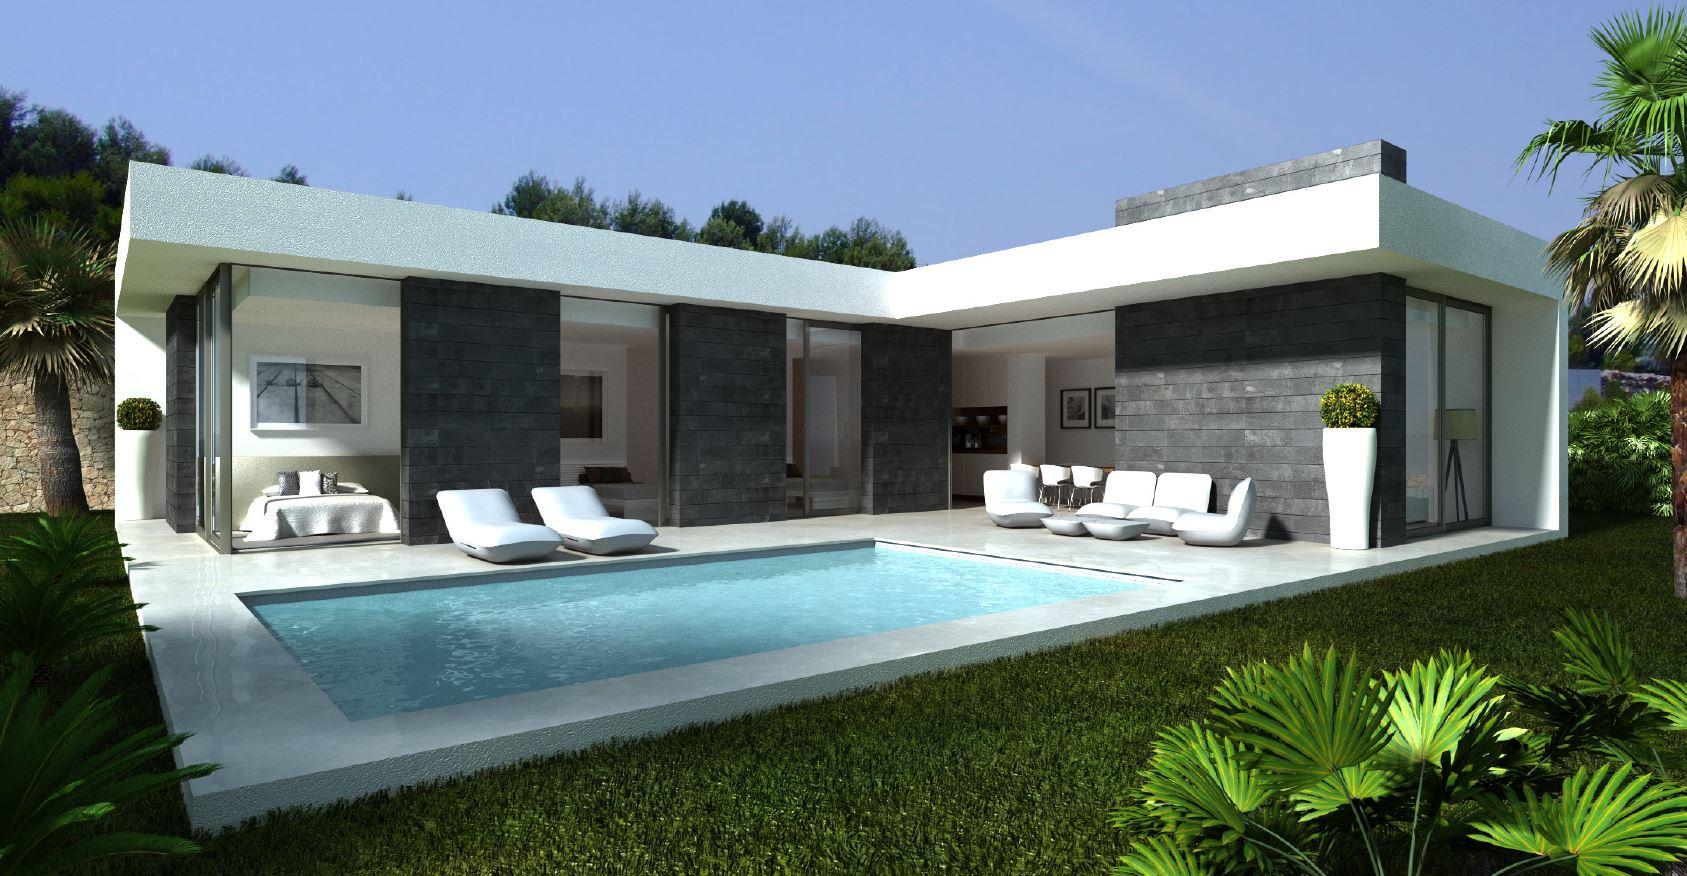 Luxury designer villas built to order in denia large for Glass house luxury villa